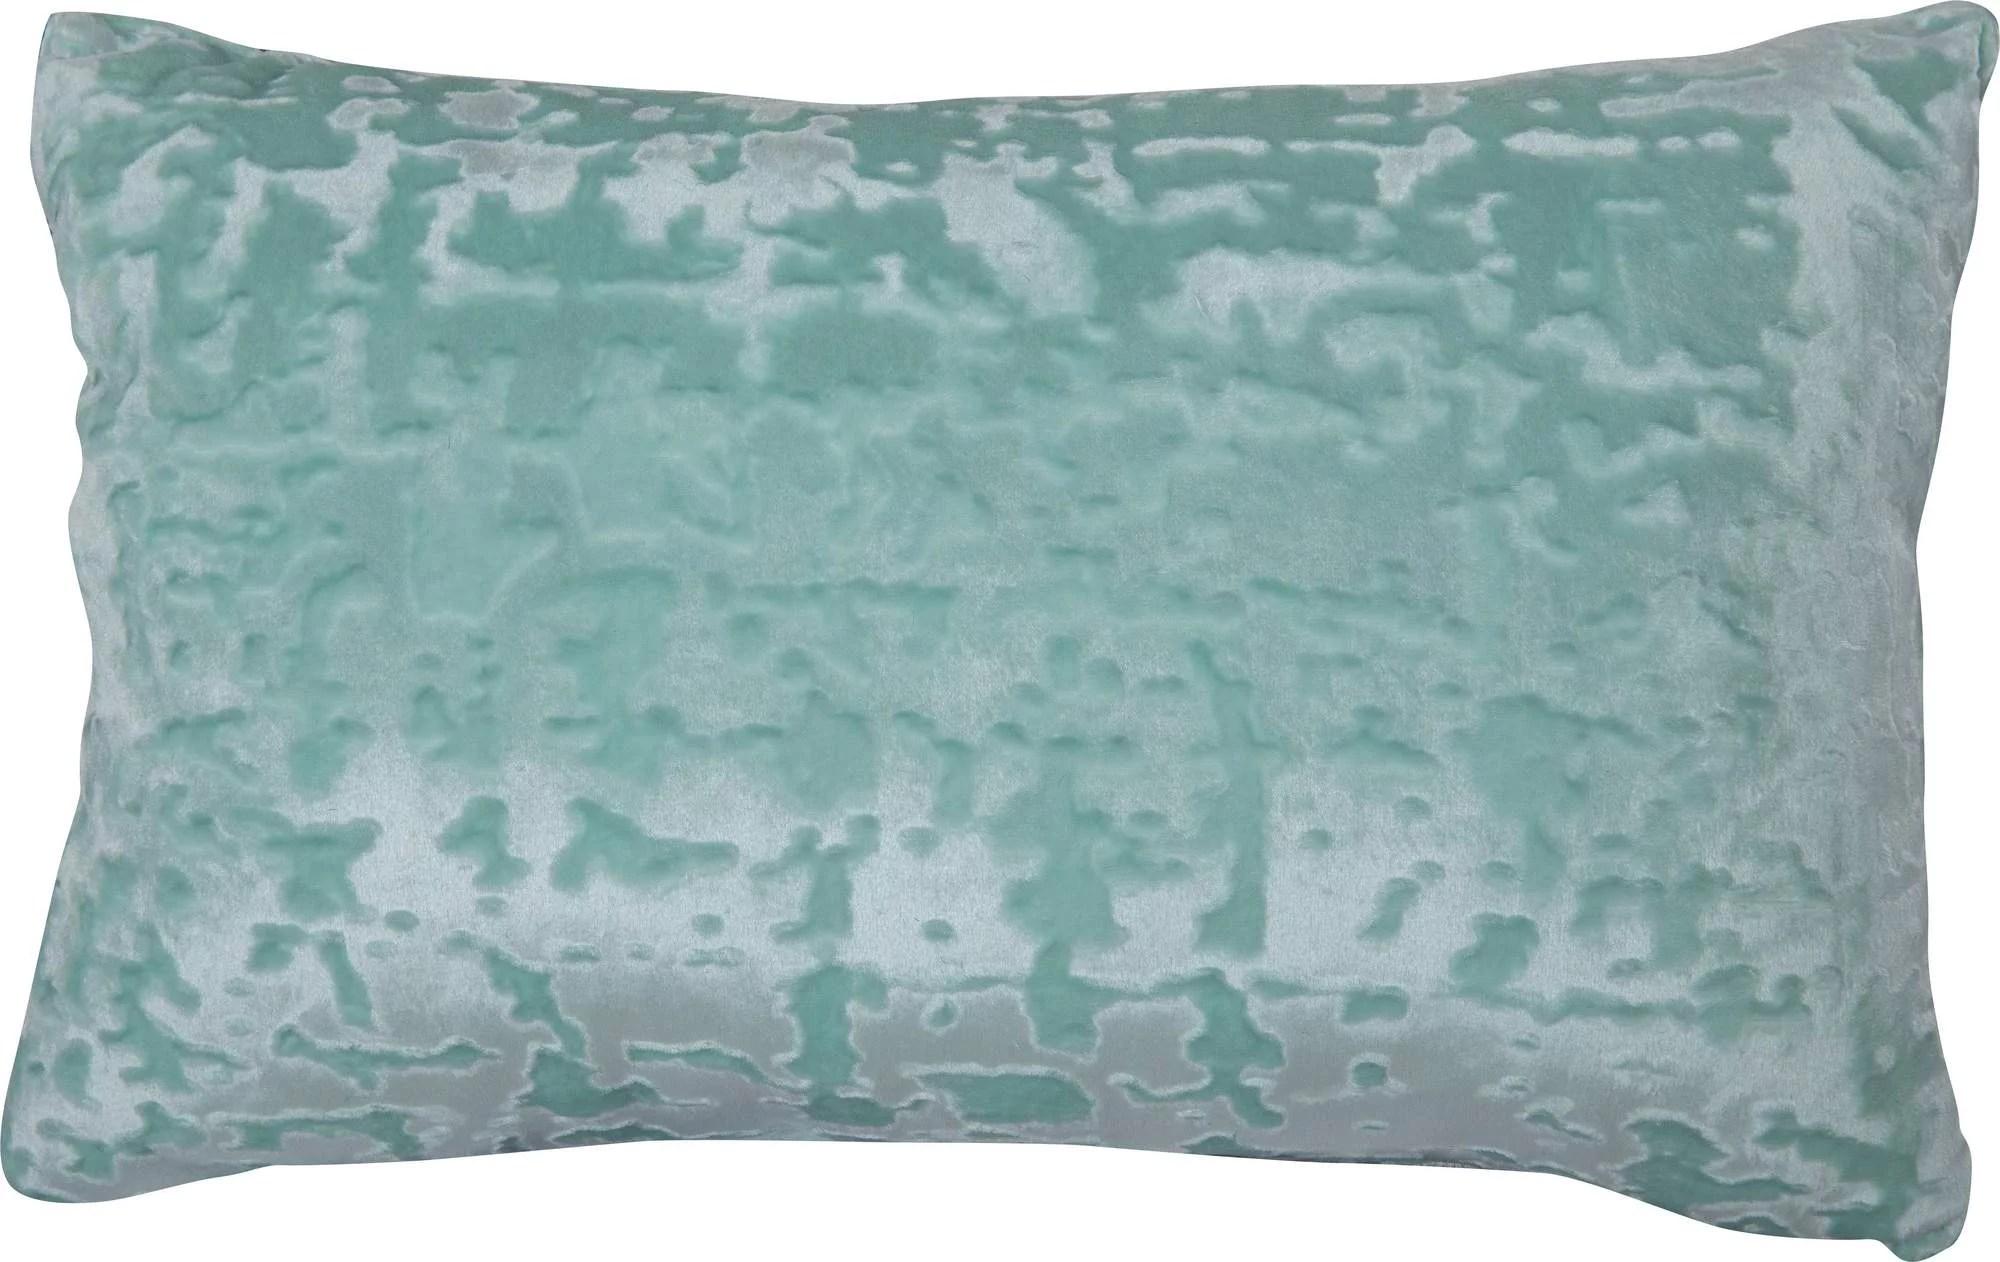 mainstays velvet oblong decorative throw pillow mint